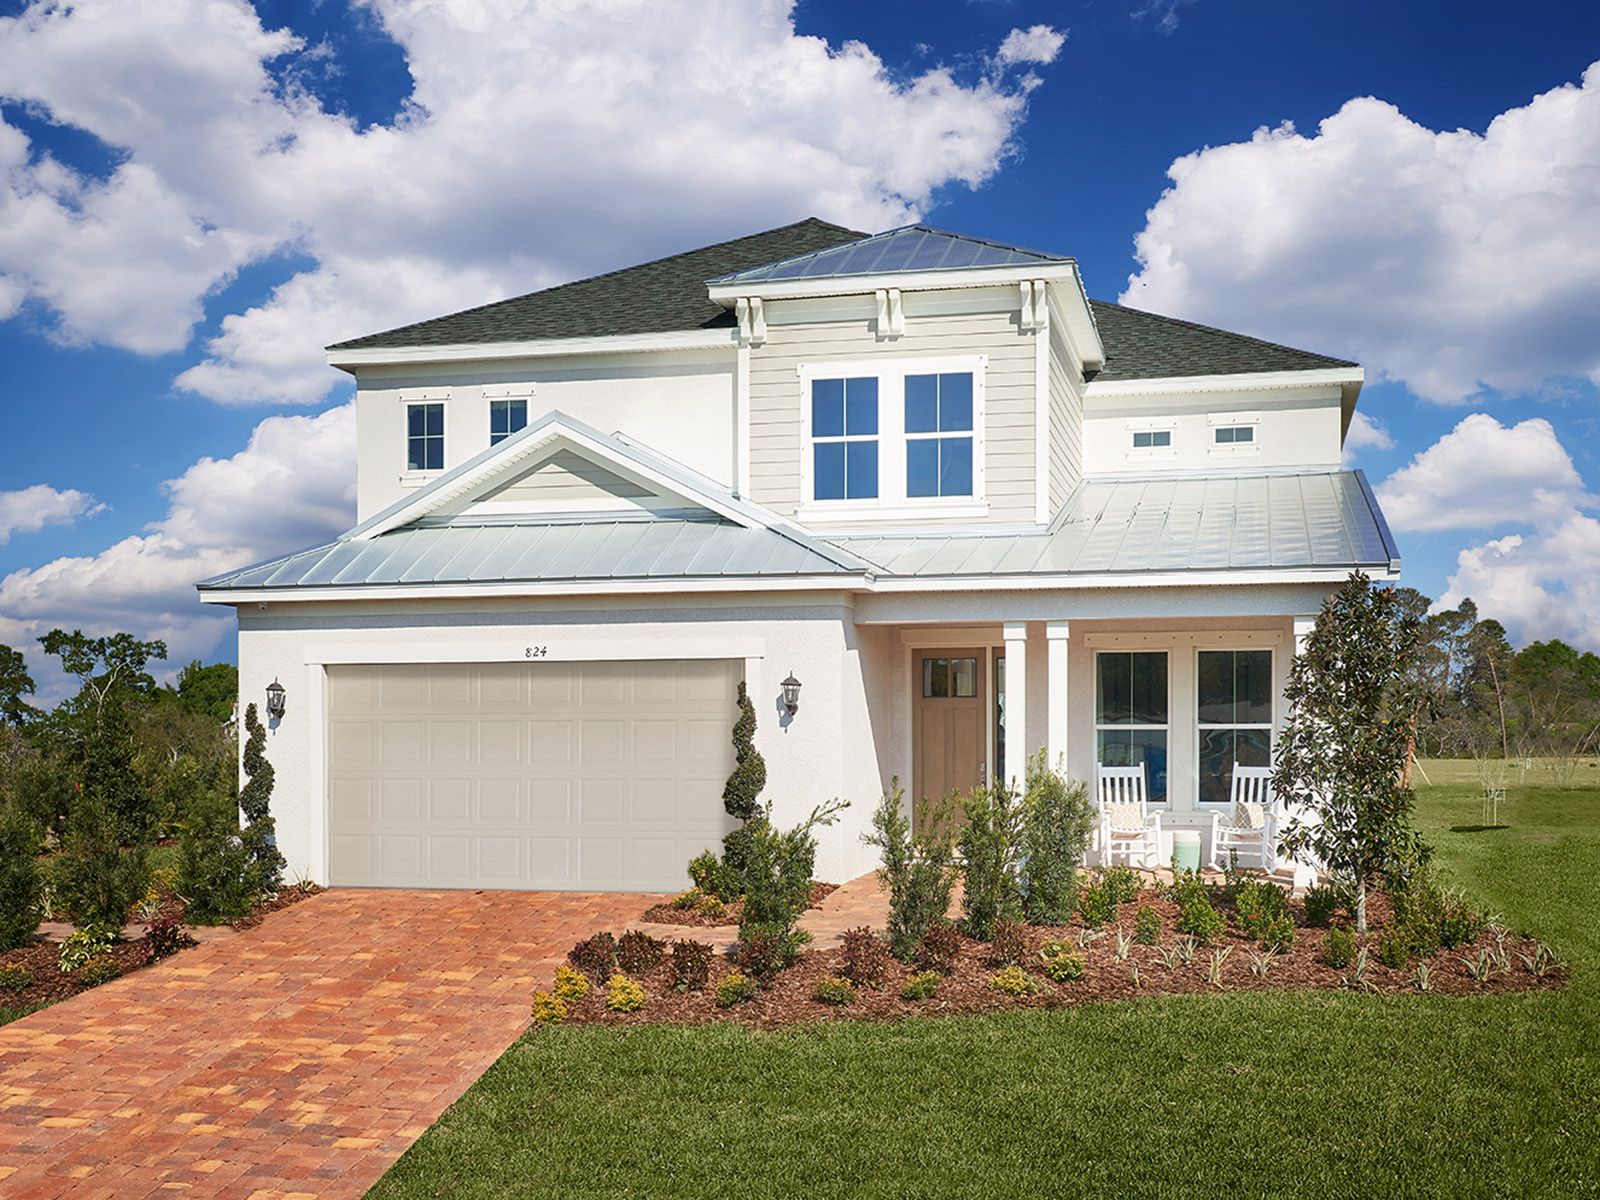 Single Family for Sale at Royal 860 W. Bayshore Drive Tarpon Springs, Florida 34689 United States